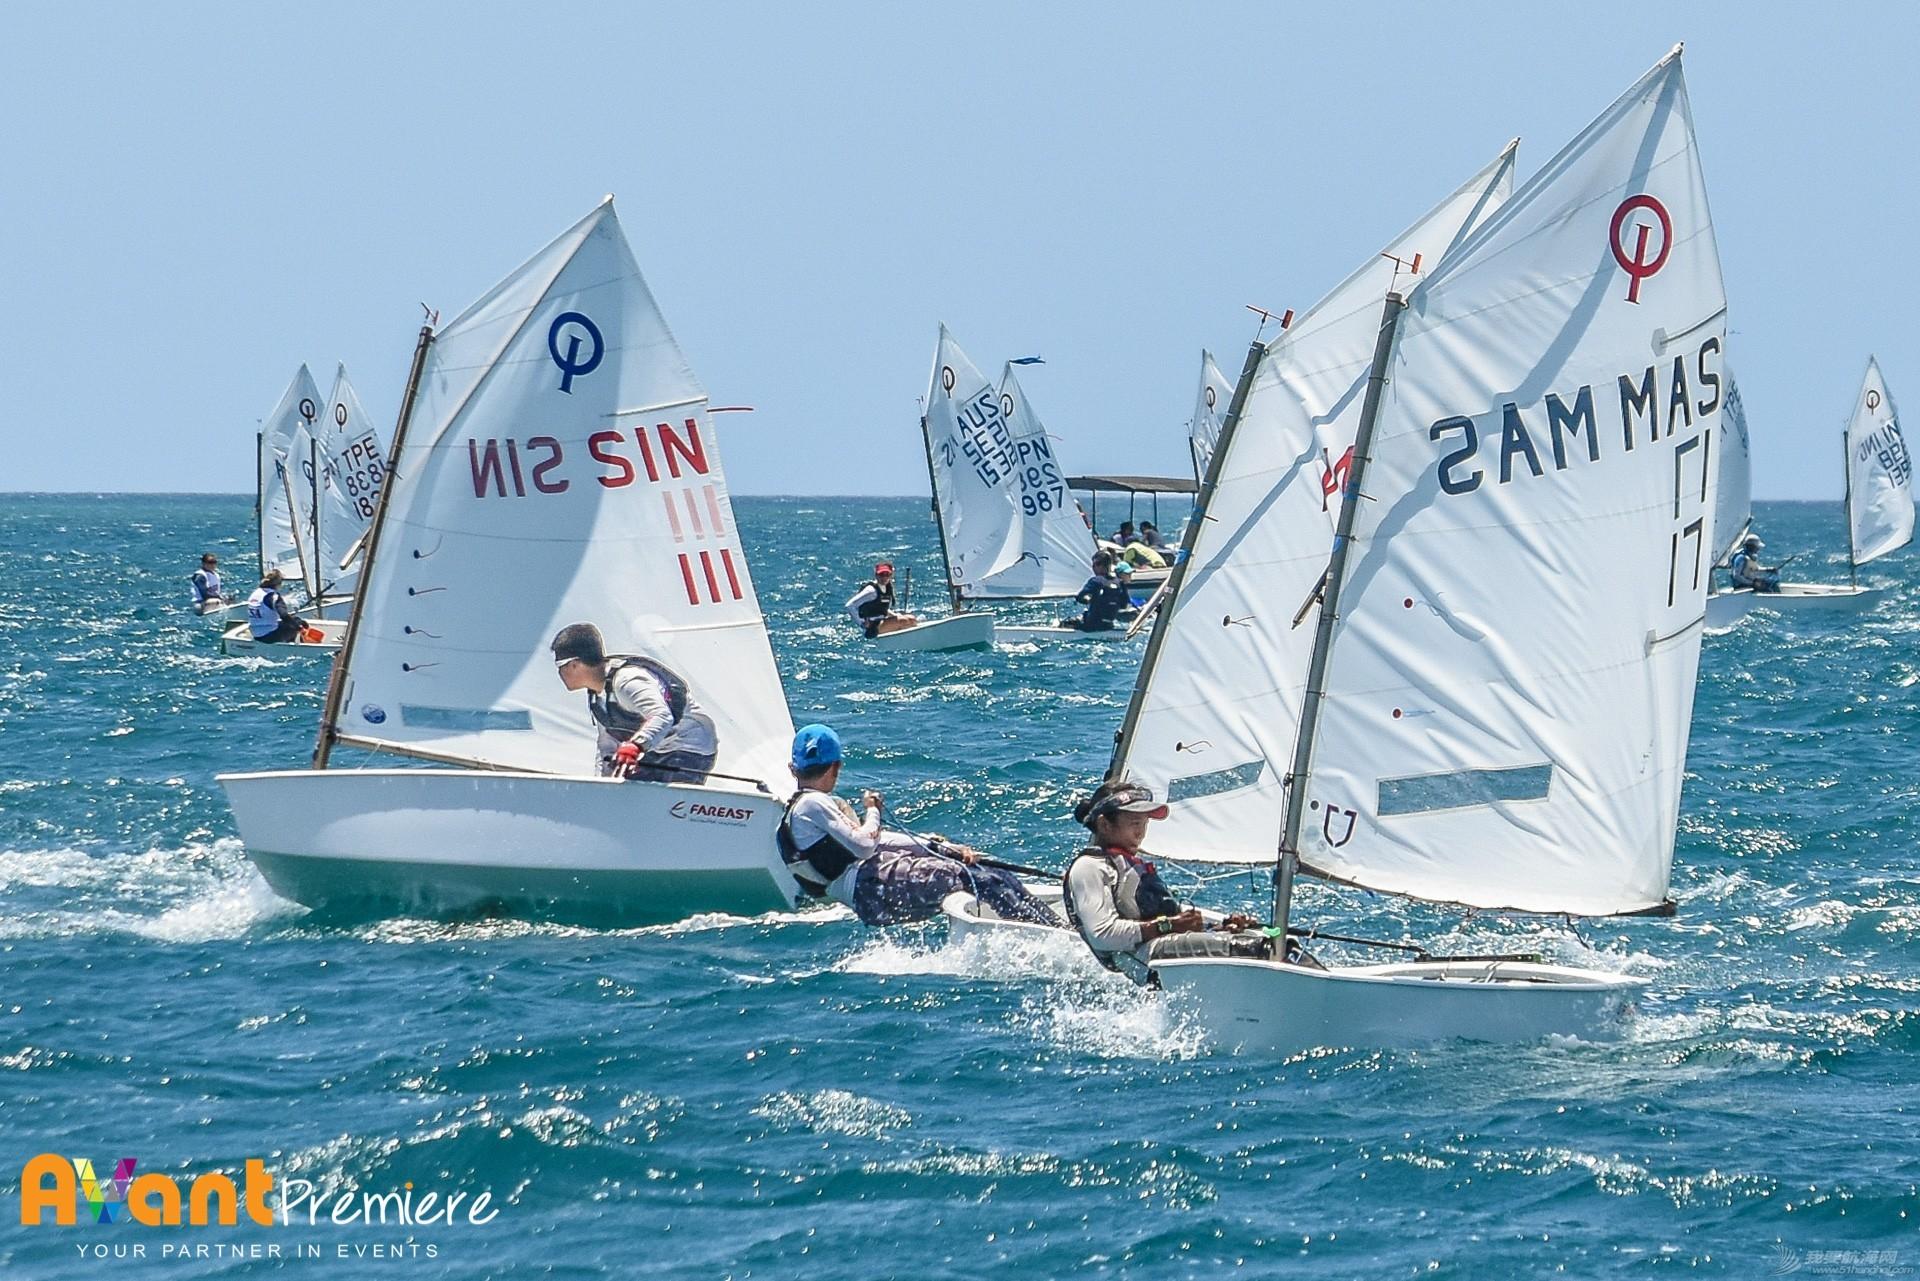 nbsp,帆船,FAREAST,提供,俱乐部 上海海尚帆友俱乐部【Shanghai Sailing Club】  155944x2rt2whaussfm5ow